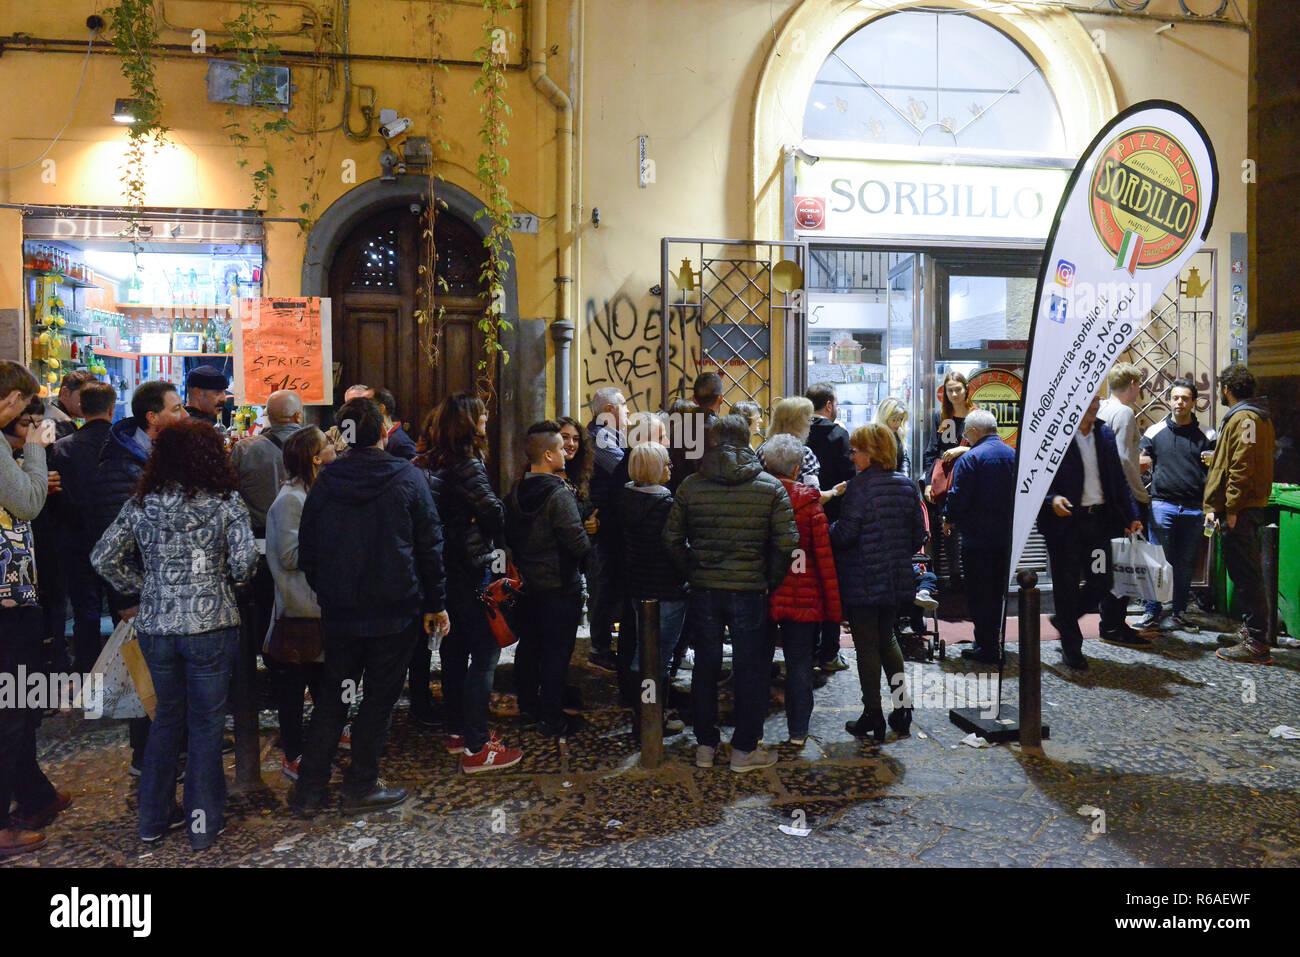 "'Pizzeria' orbillo'', Via dei Tribunali, Neapel, Italien"", ""Pizzeria orbillo', Neapel, Italien Stockbild"